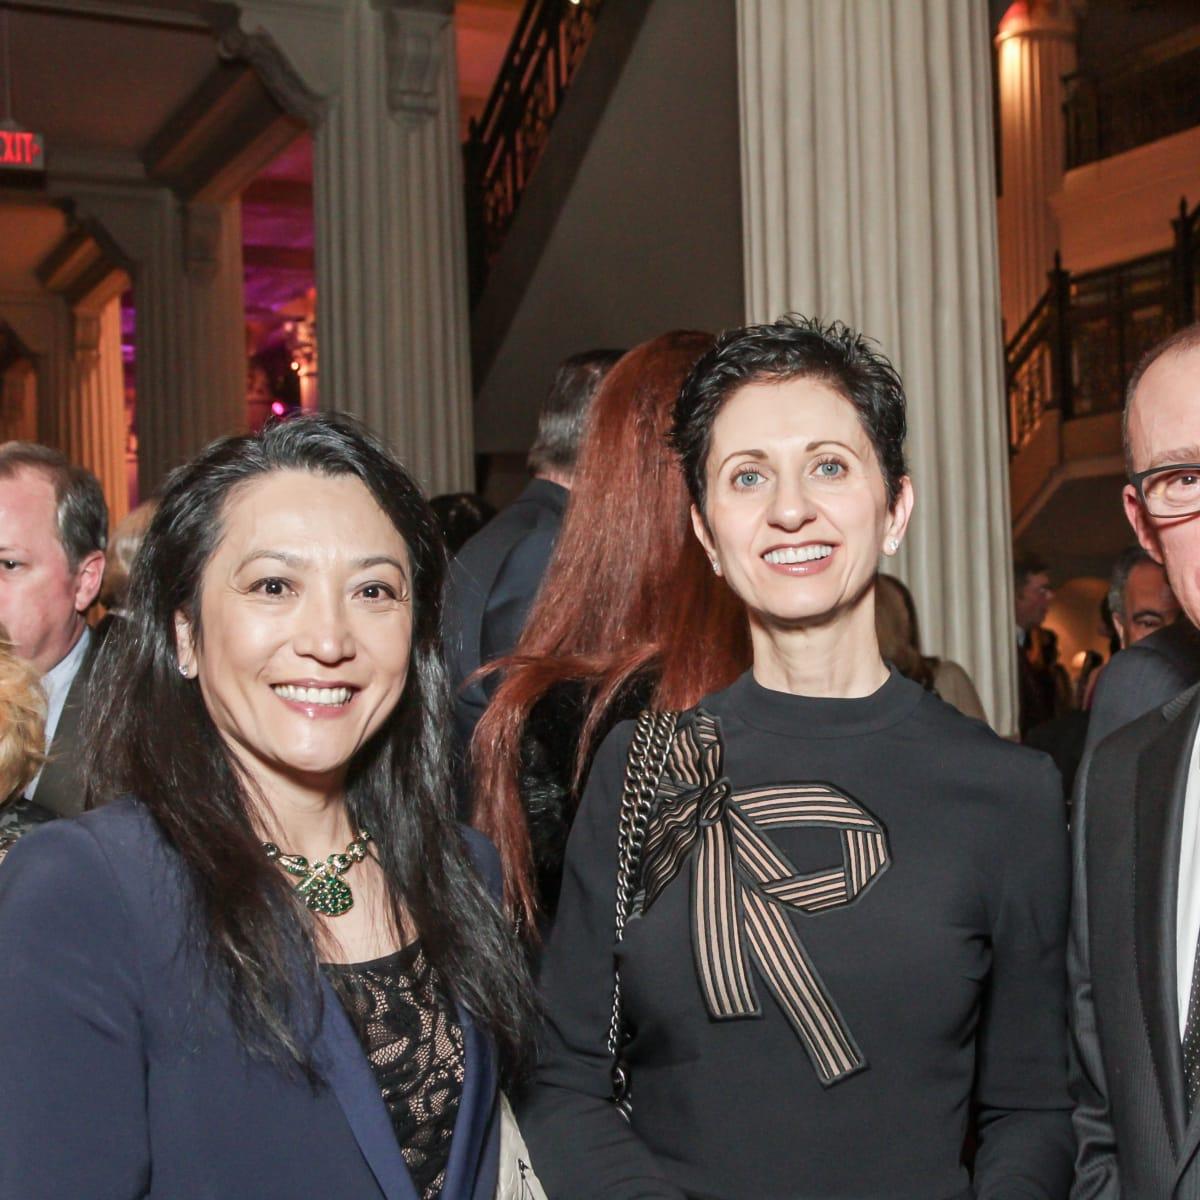 Nathalie Roff, Lilliane Nahas, Cesar Nahas at Club da Camera